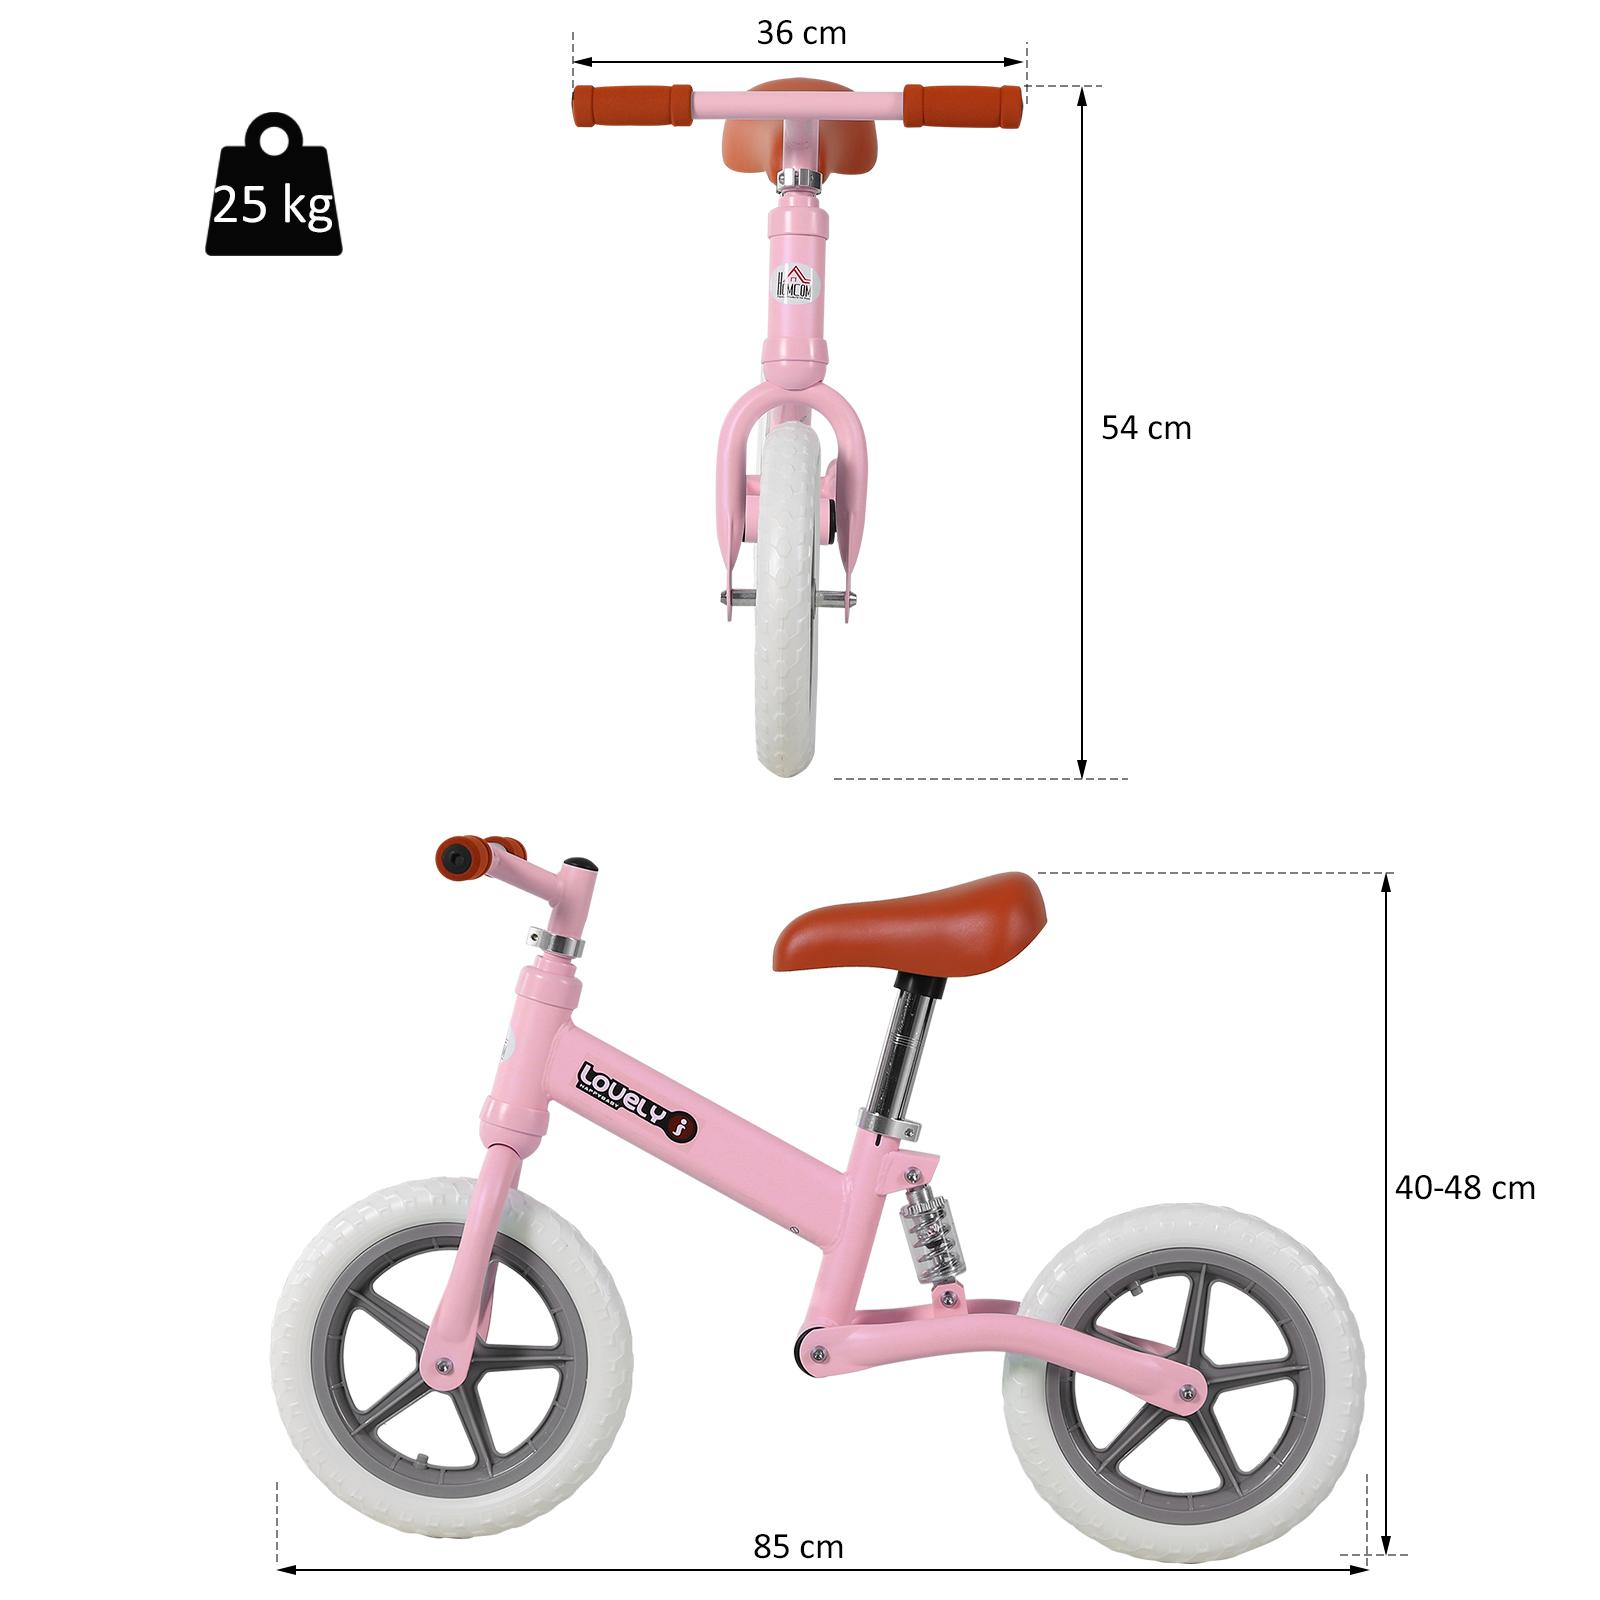 Indexbild 24 - HOMCOM Laufrad mit Stoßdämpfer Kinderrad Lauflernrad Balance Bike 2-5 Jahre